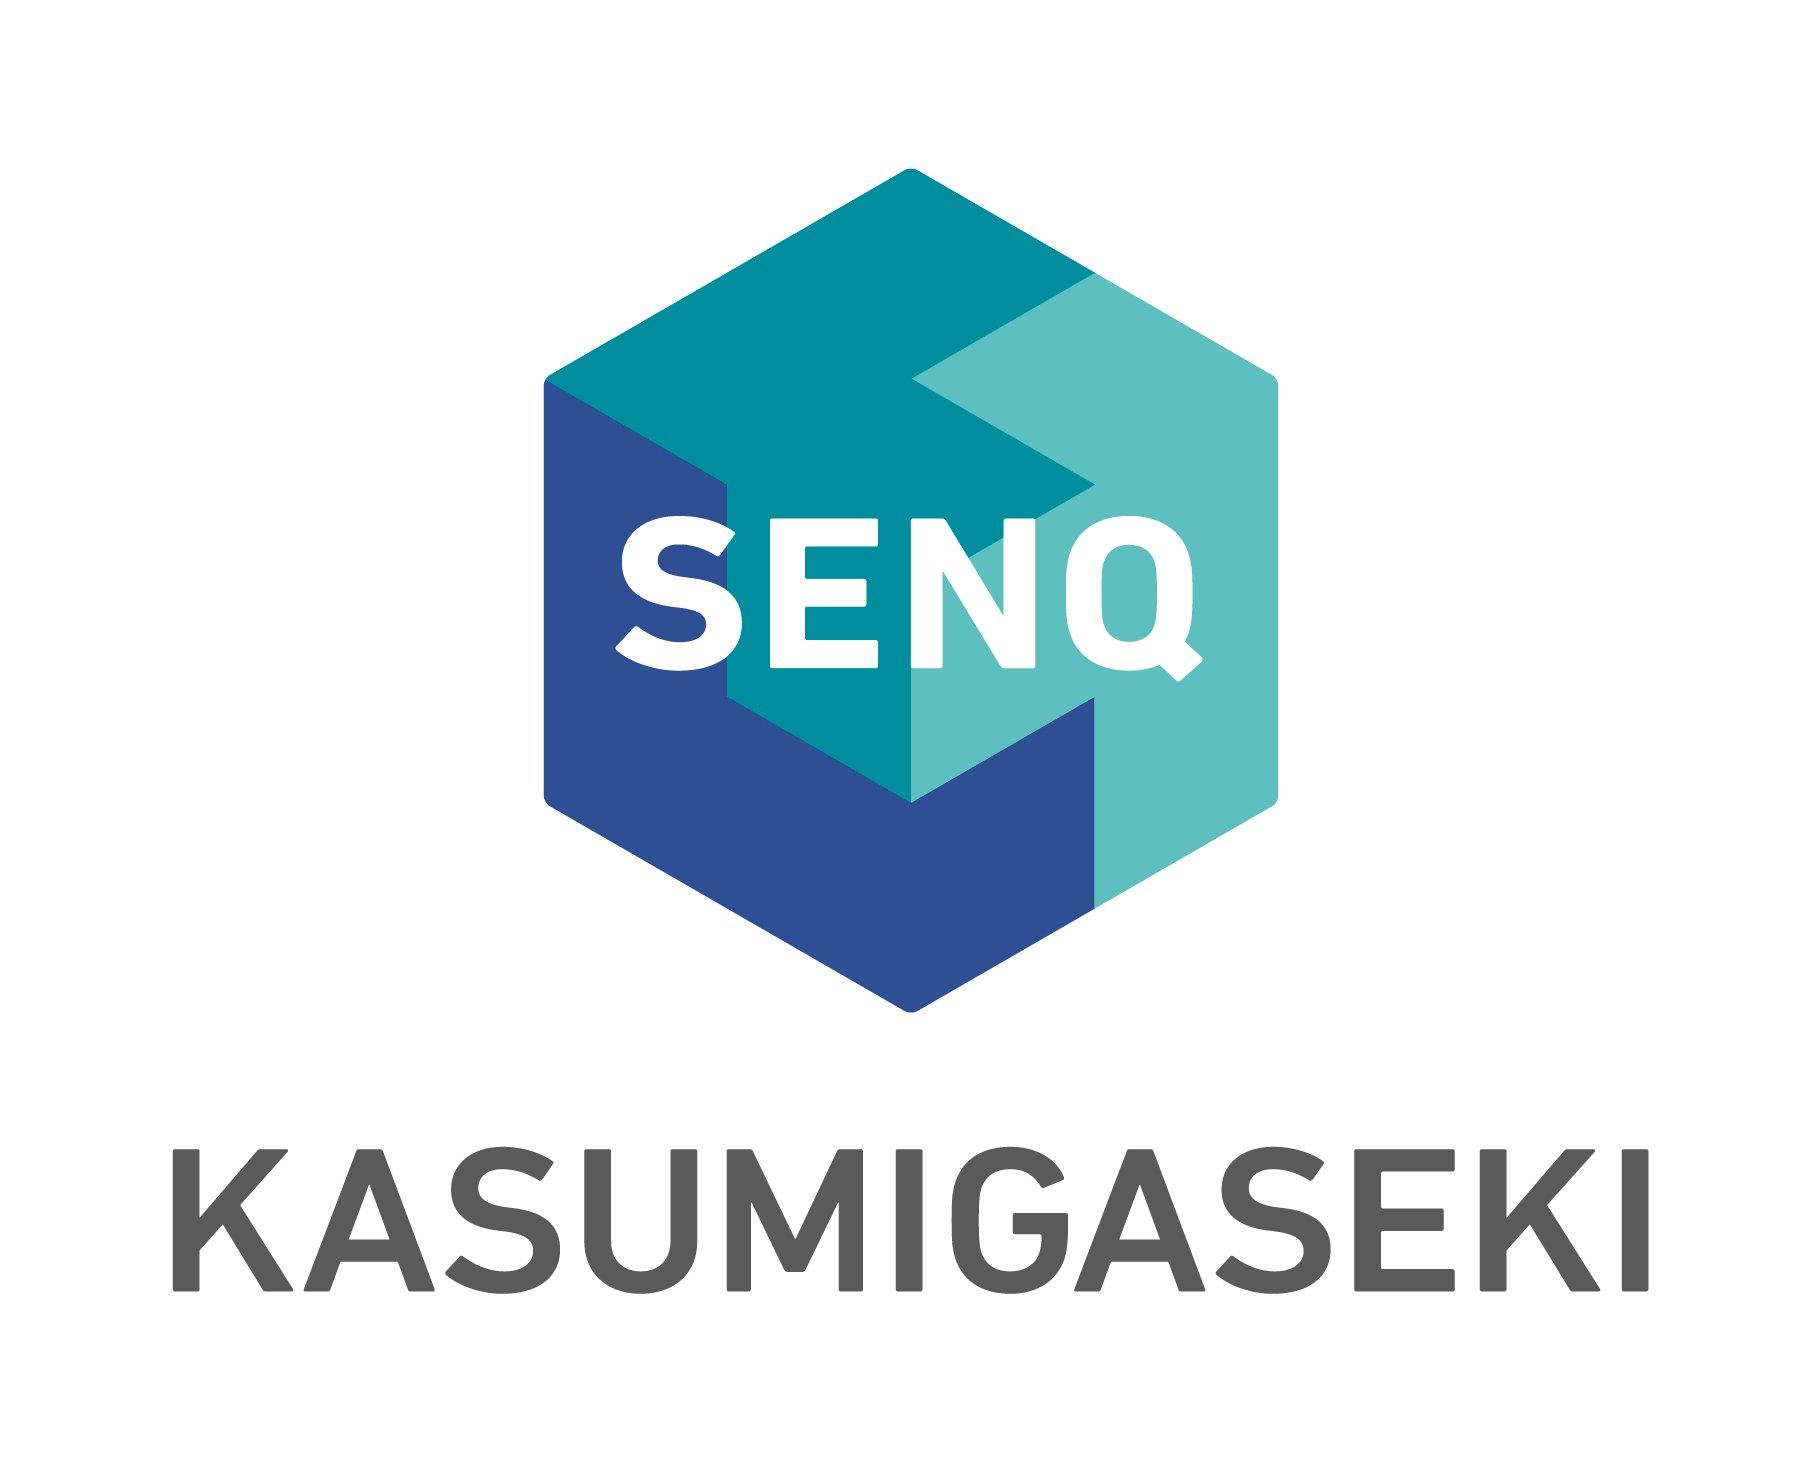 10_SENQ_brandlogo_KASUMIGASEKI_lockup_vertical